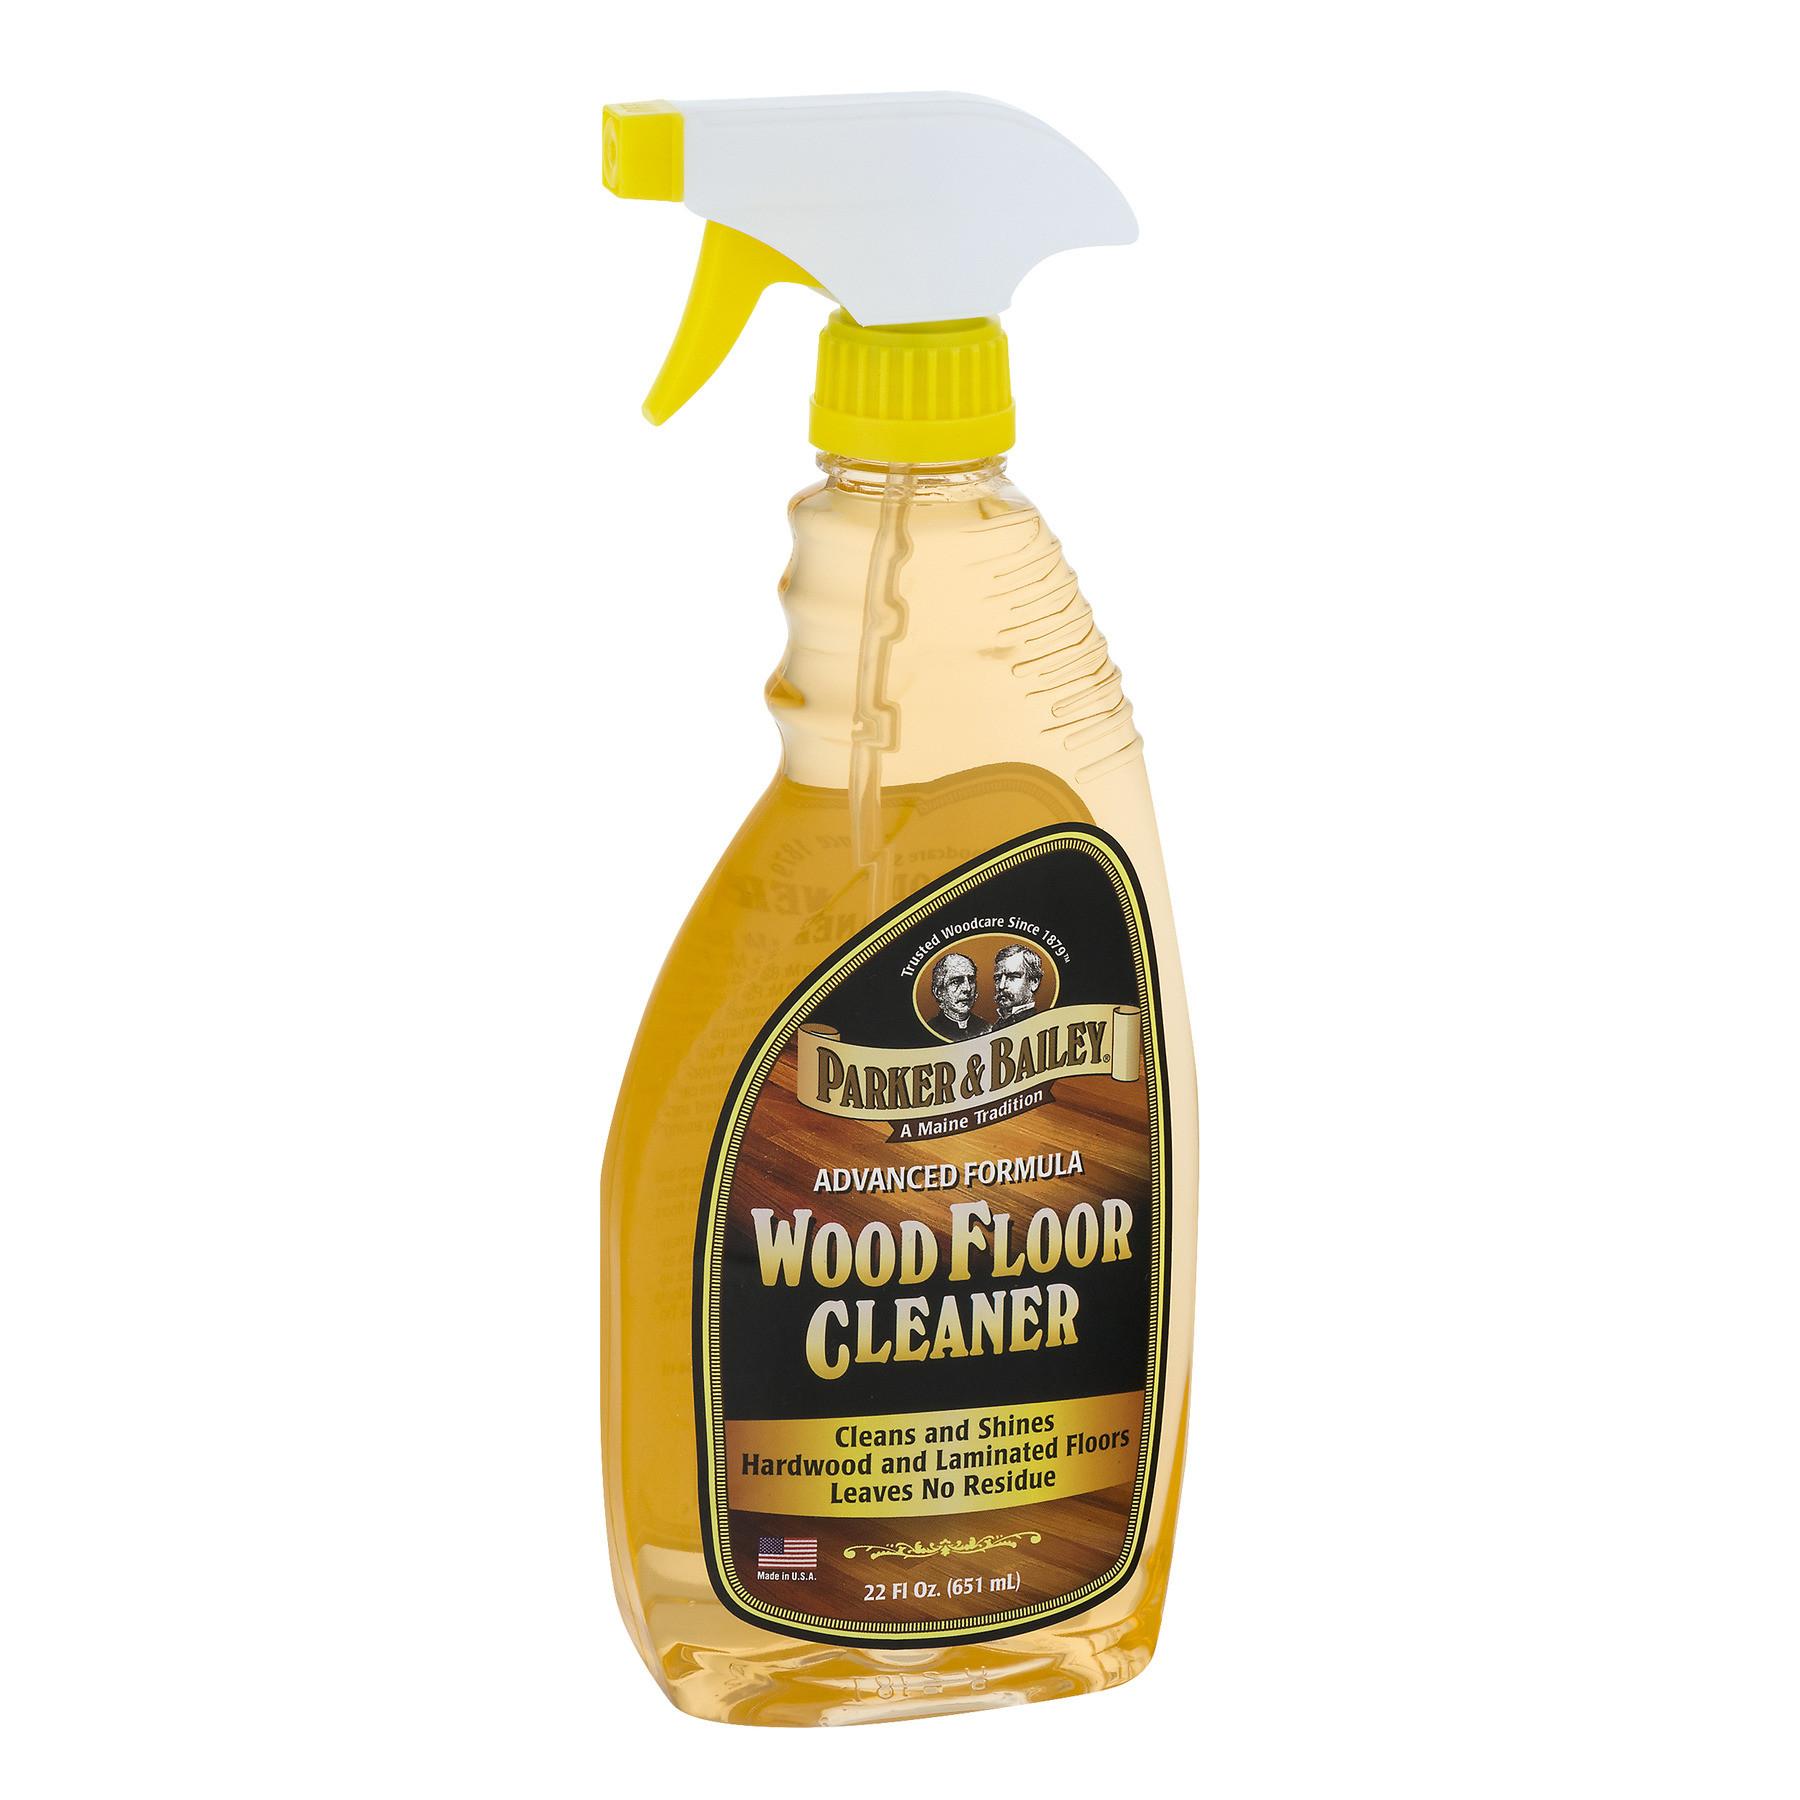 electric mops for hardwood floors of parker bailey wood floor cleaner 22 oz spray bottle walmart com within 9e6e8fdd 7fd7 463e be96 16f78ccc6b3a 1 9ded3af3fcff56de3a384a585d8a51af